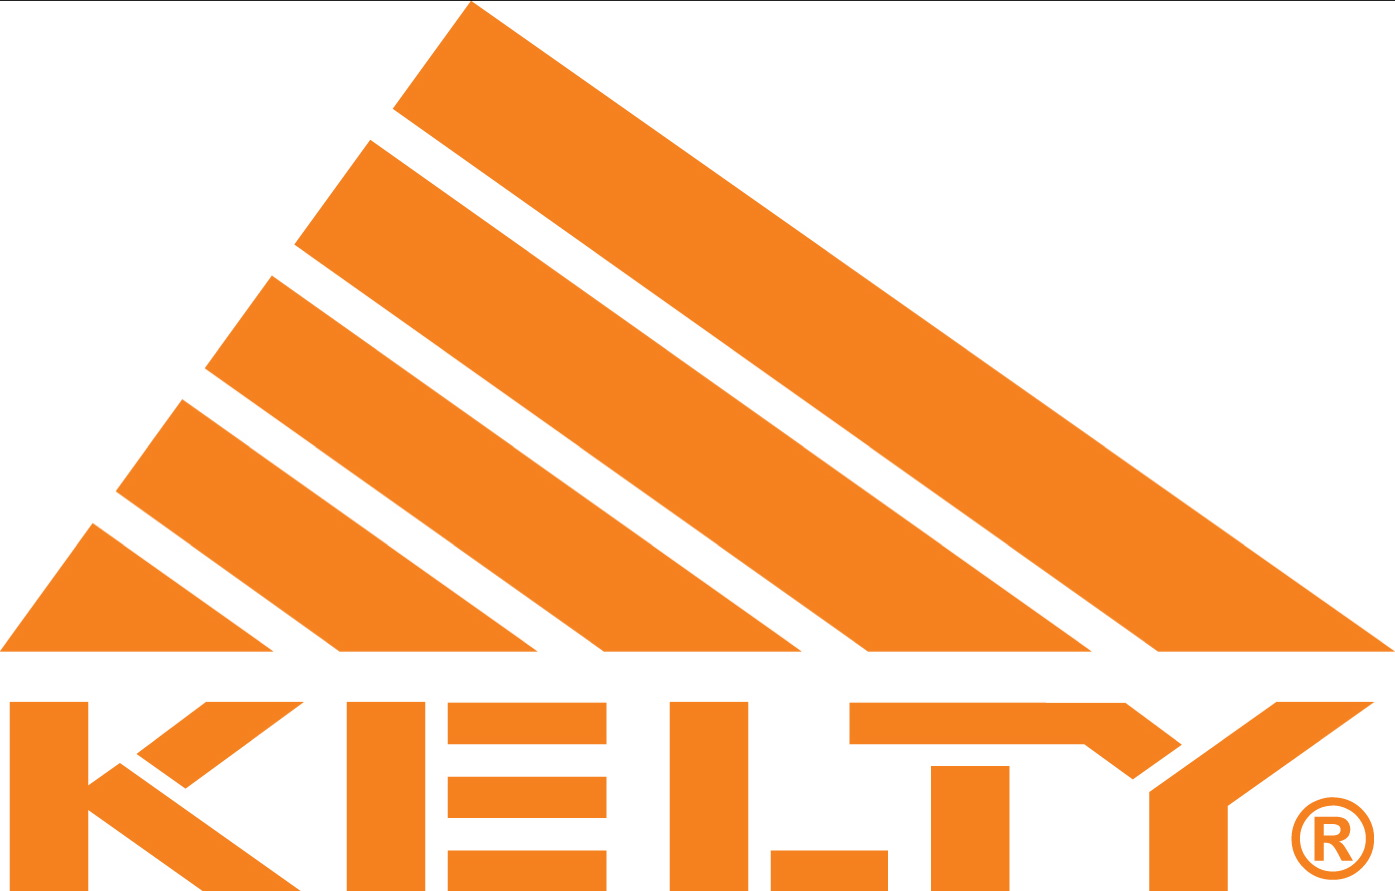 kelty-logo-5x5orange1.jpg